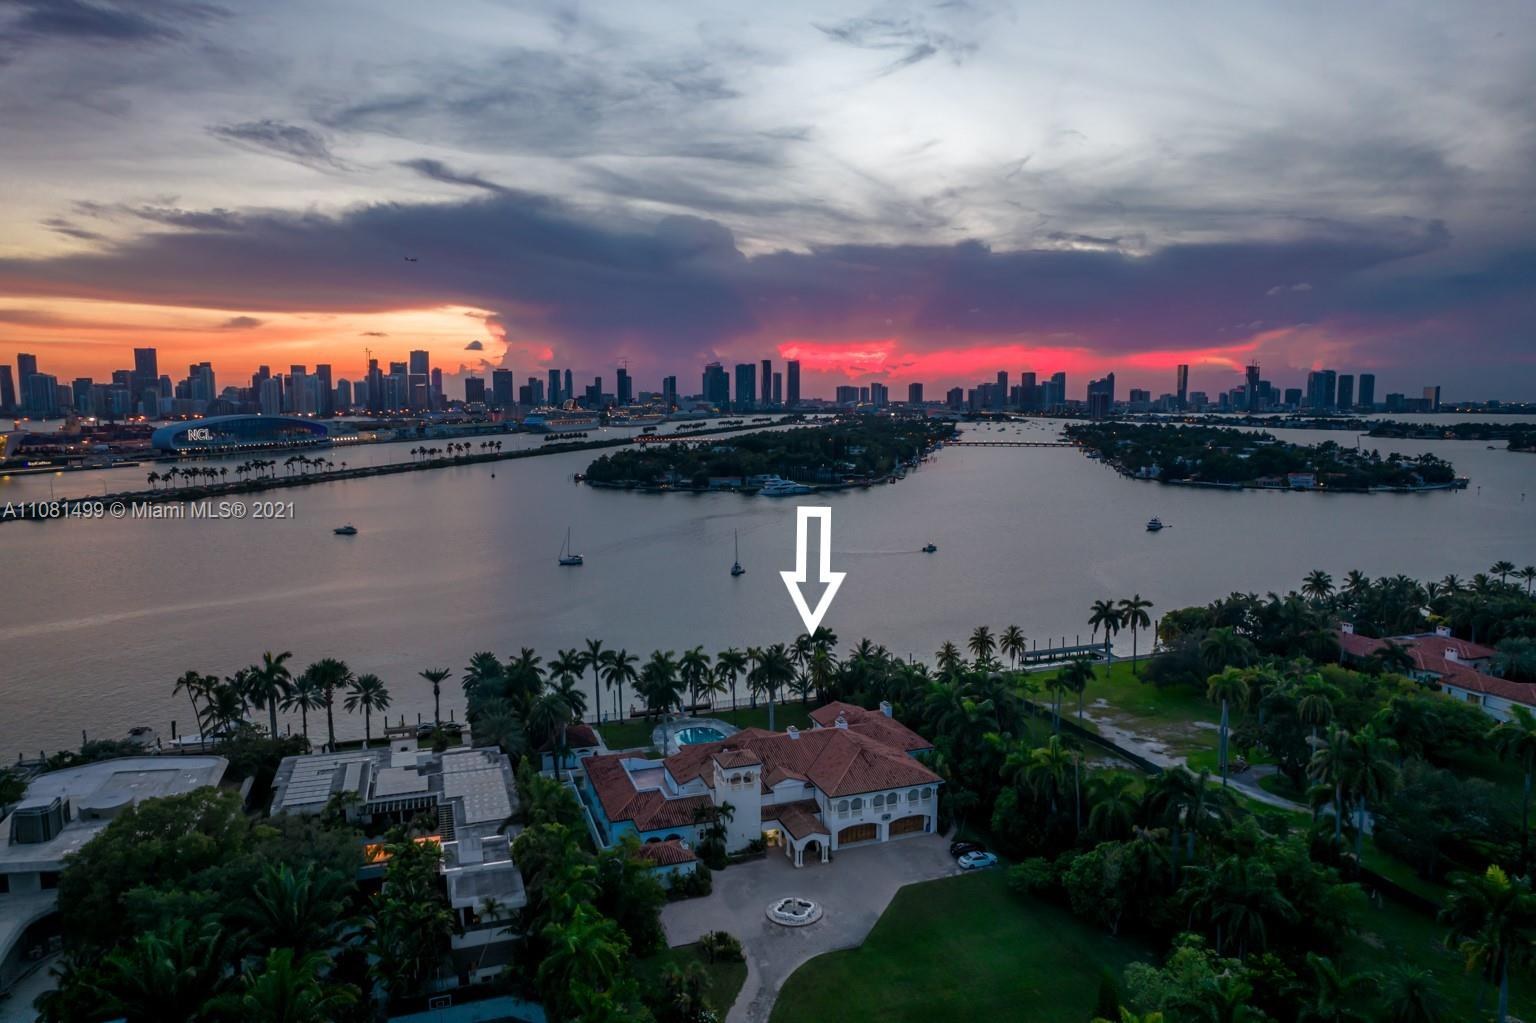 8-9 Star Island Dr, Miami Beach, Florida 33139